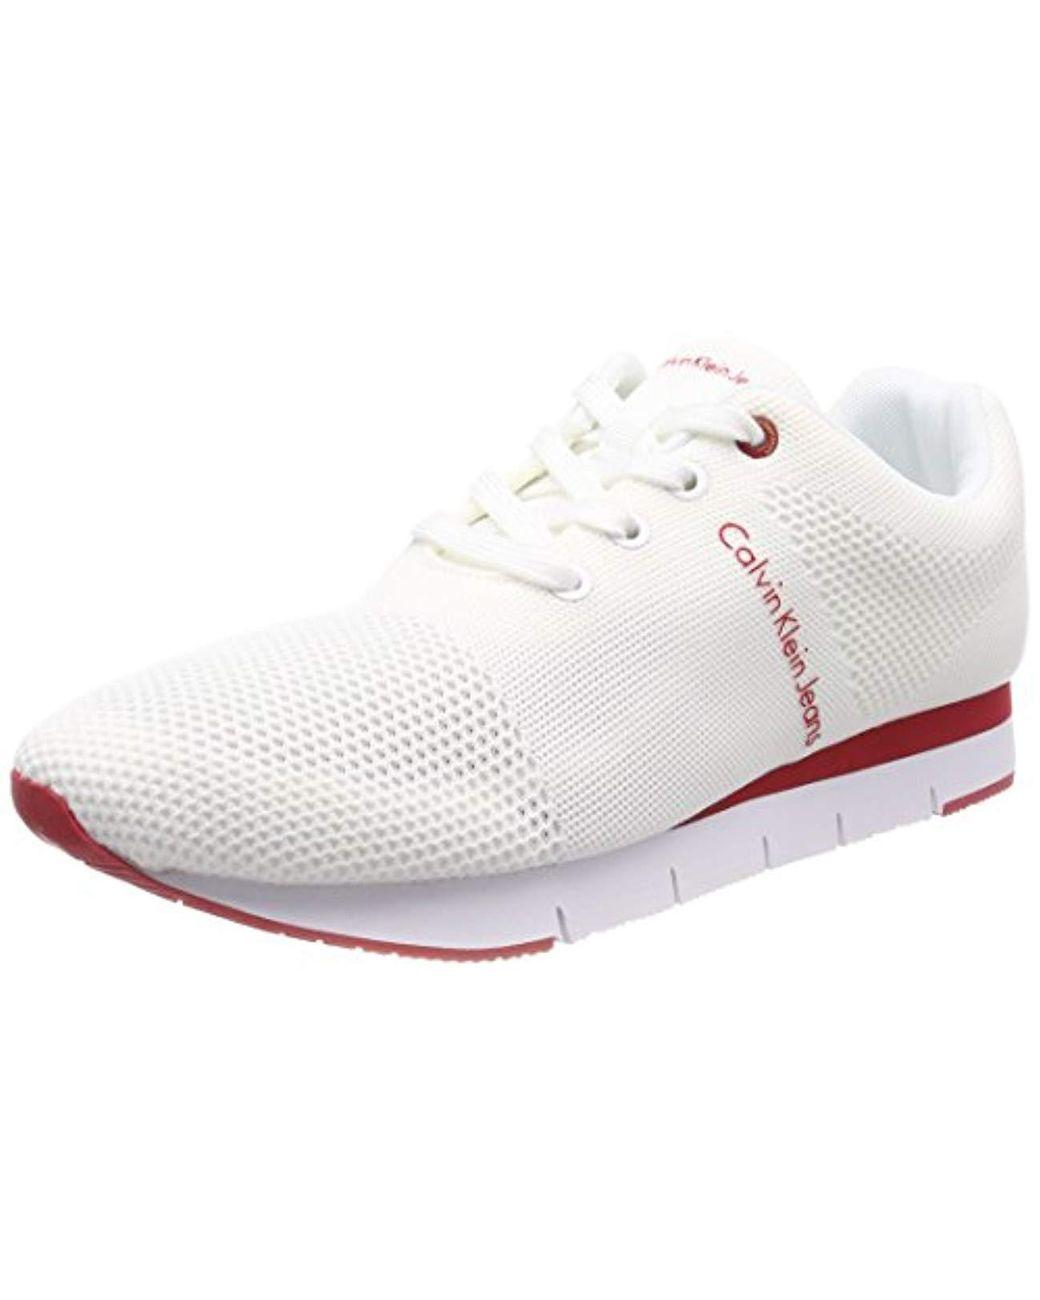 5ec0d59702f Calvin Klein Jado Mesh Low-top Sneakers in White for Men - Save 26 ...